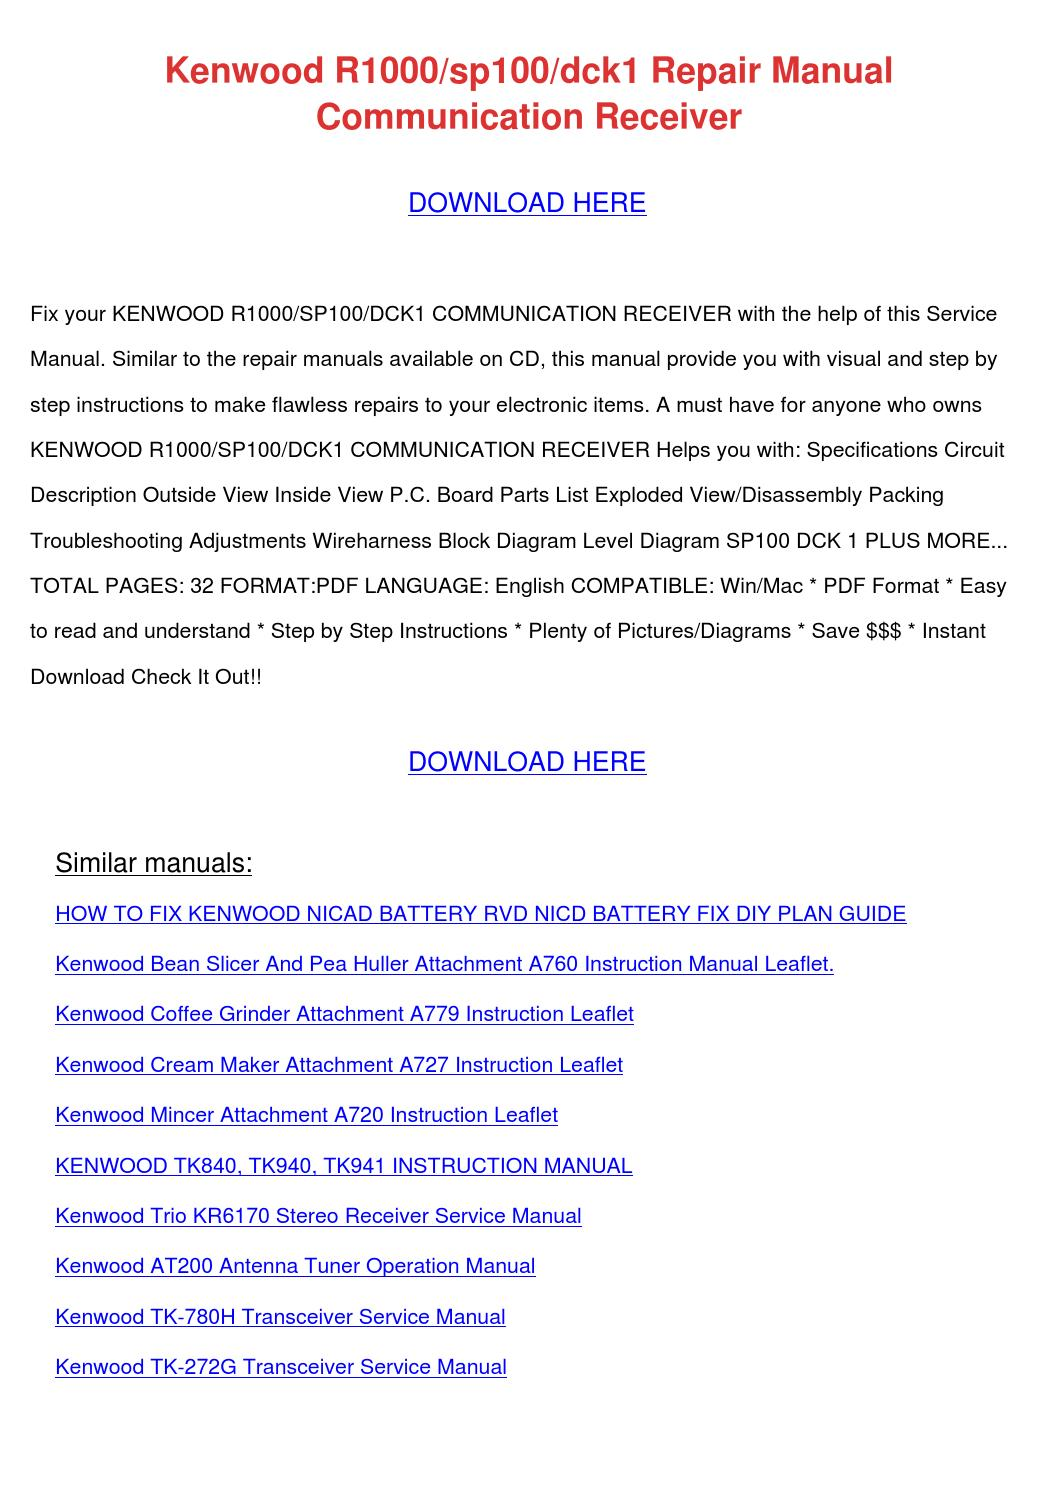 Kenwood R1000sp100dck1 Repair Manual Communic by DesmondCochran ...